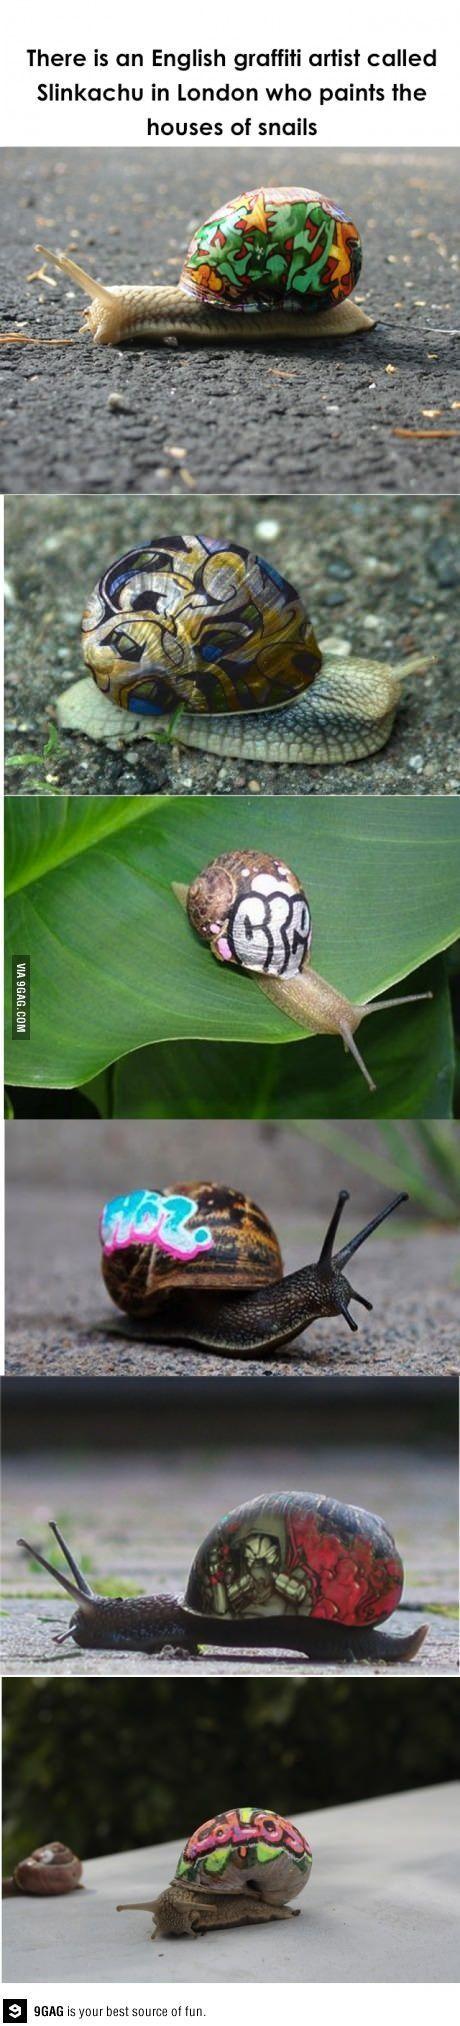 Graffiti snails roaming London as part of slow-moving art project